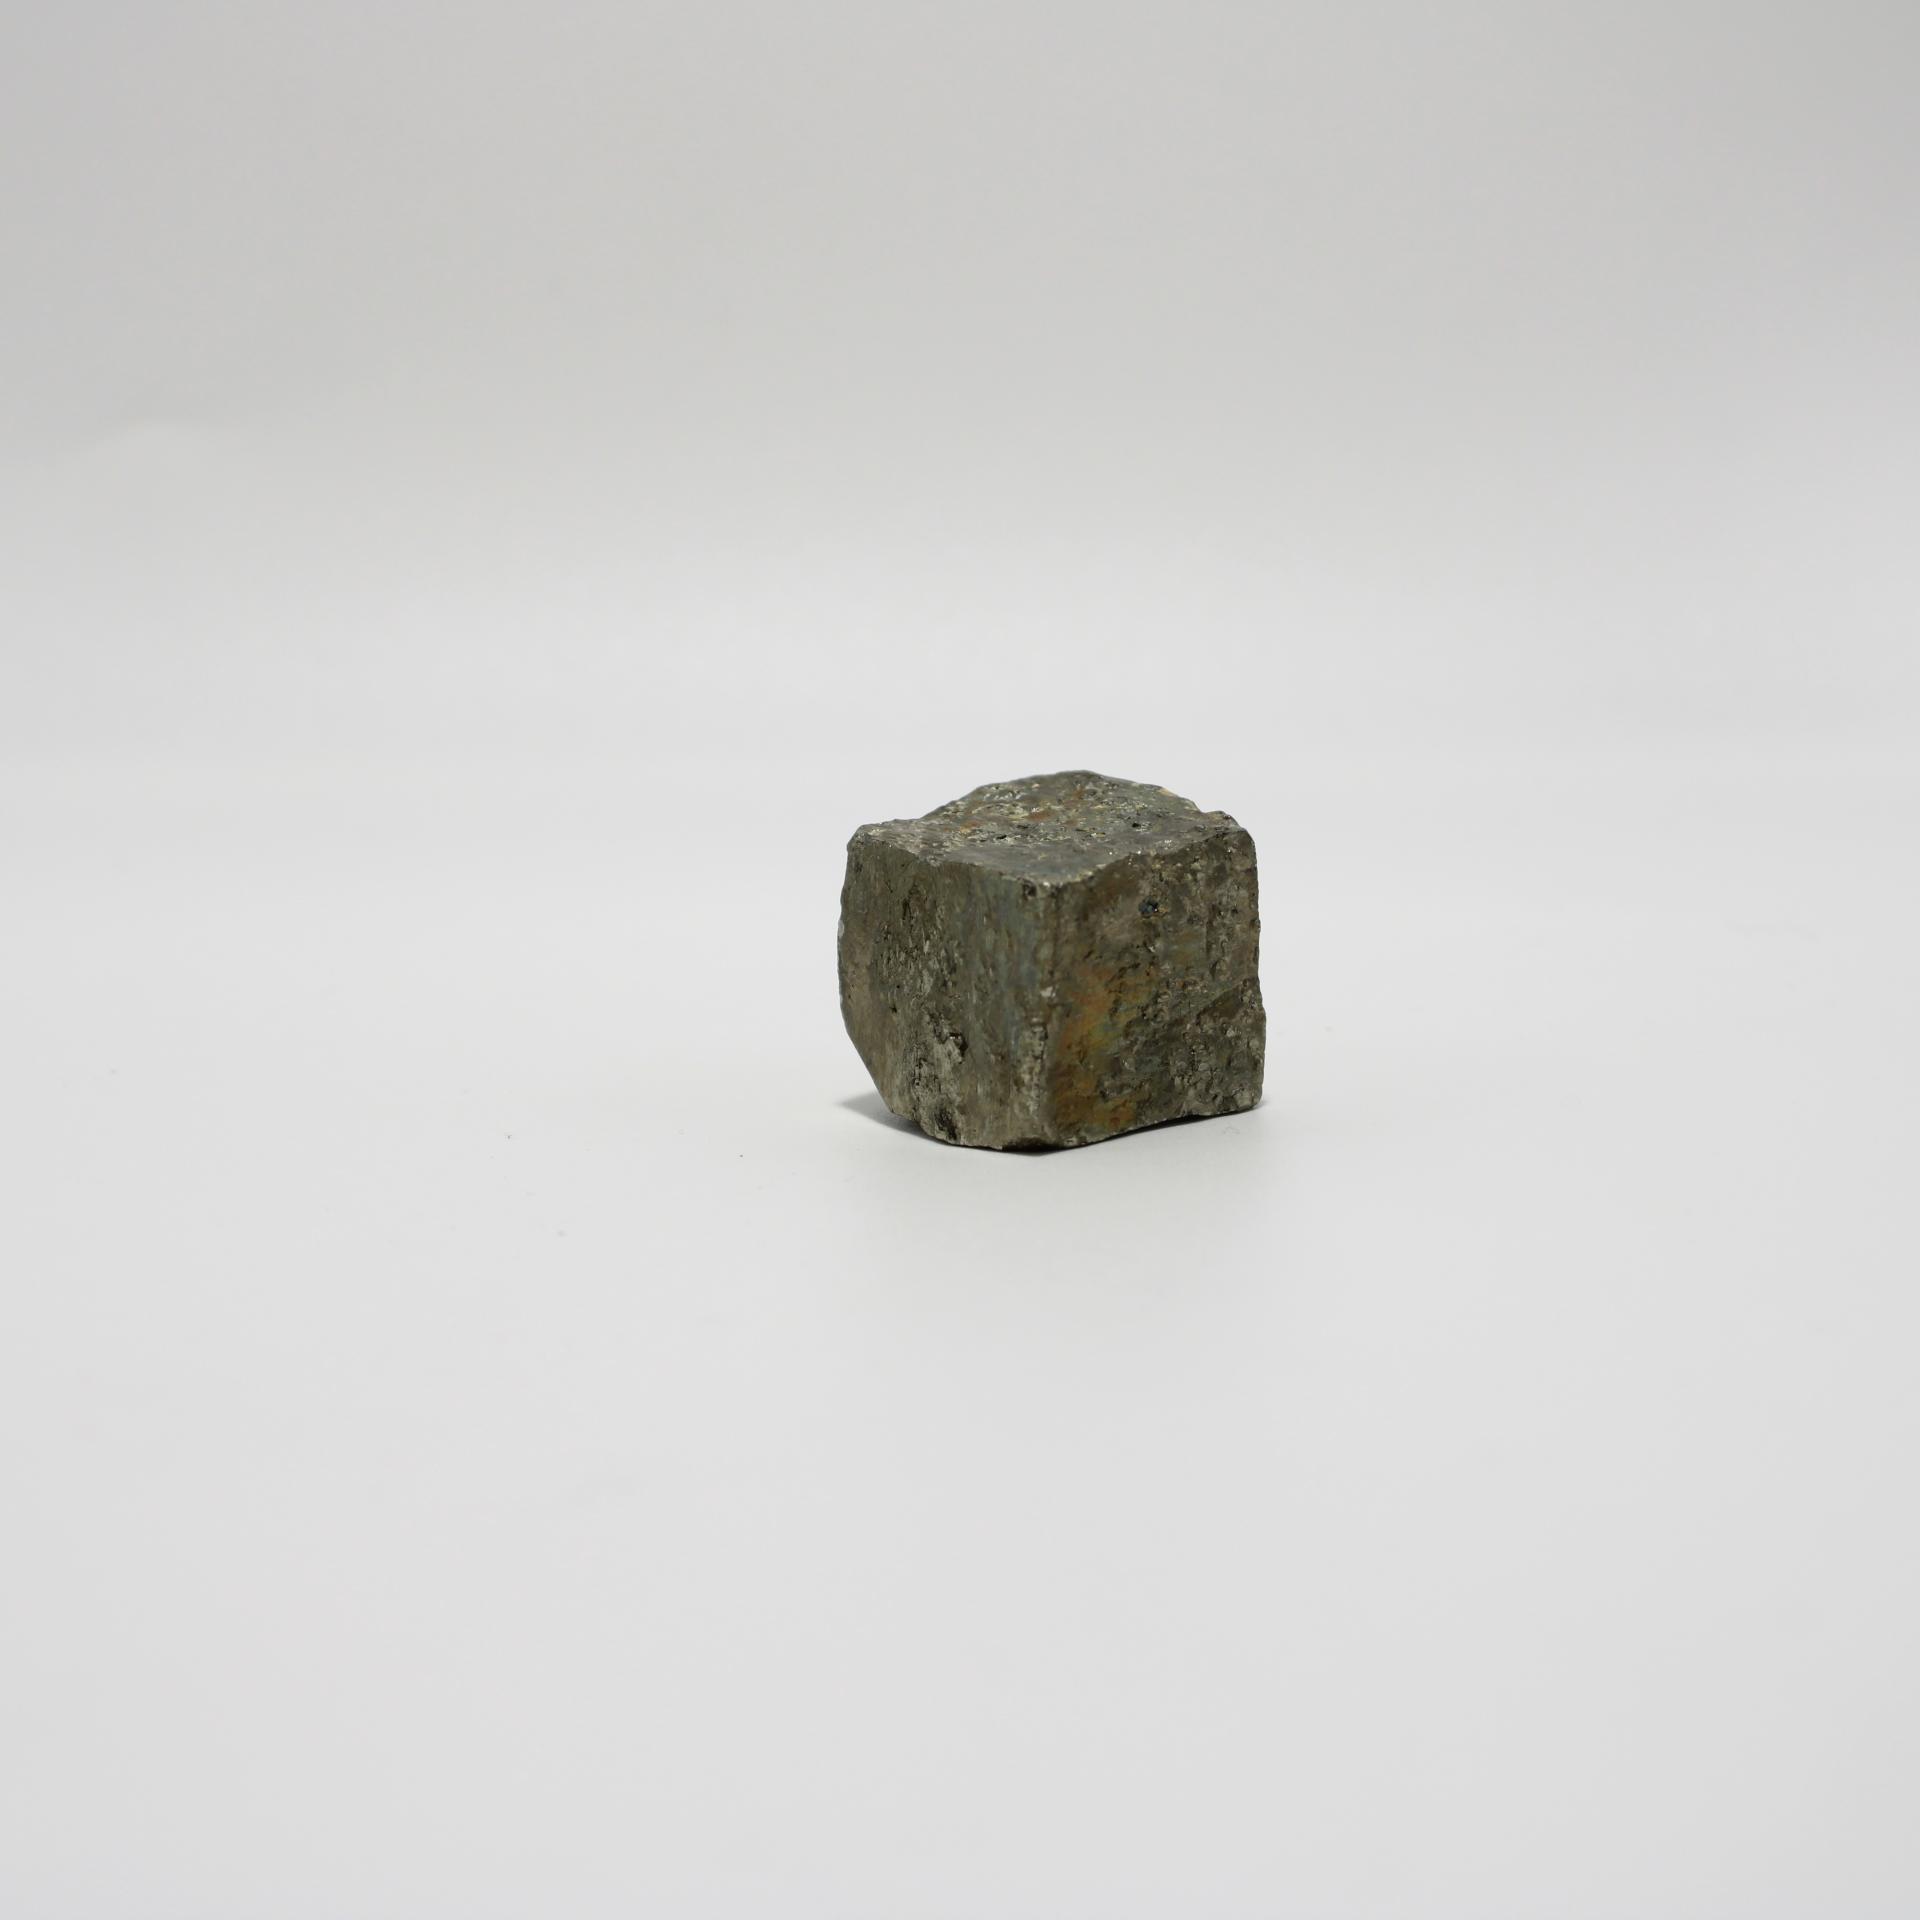 I81 pyritecube 1